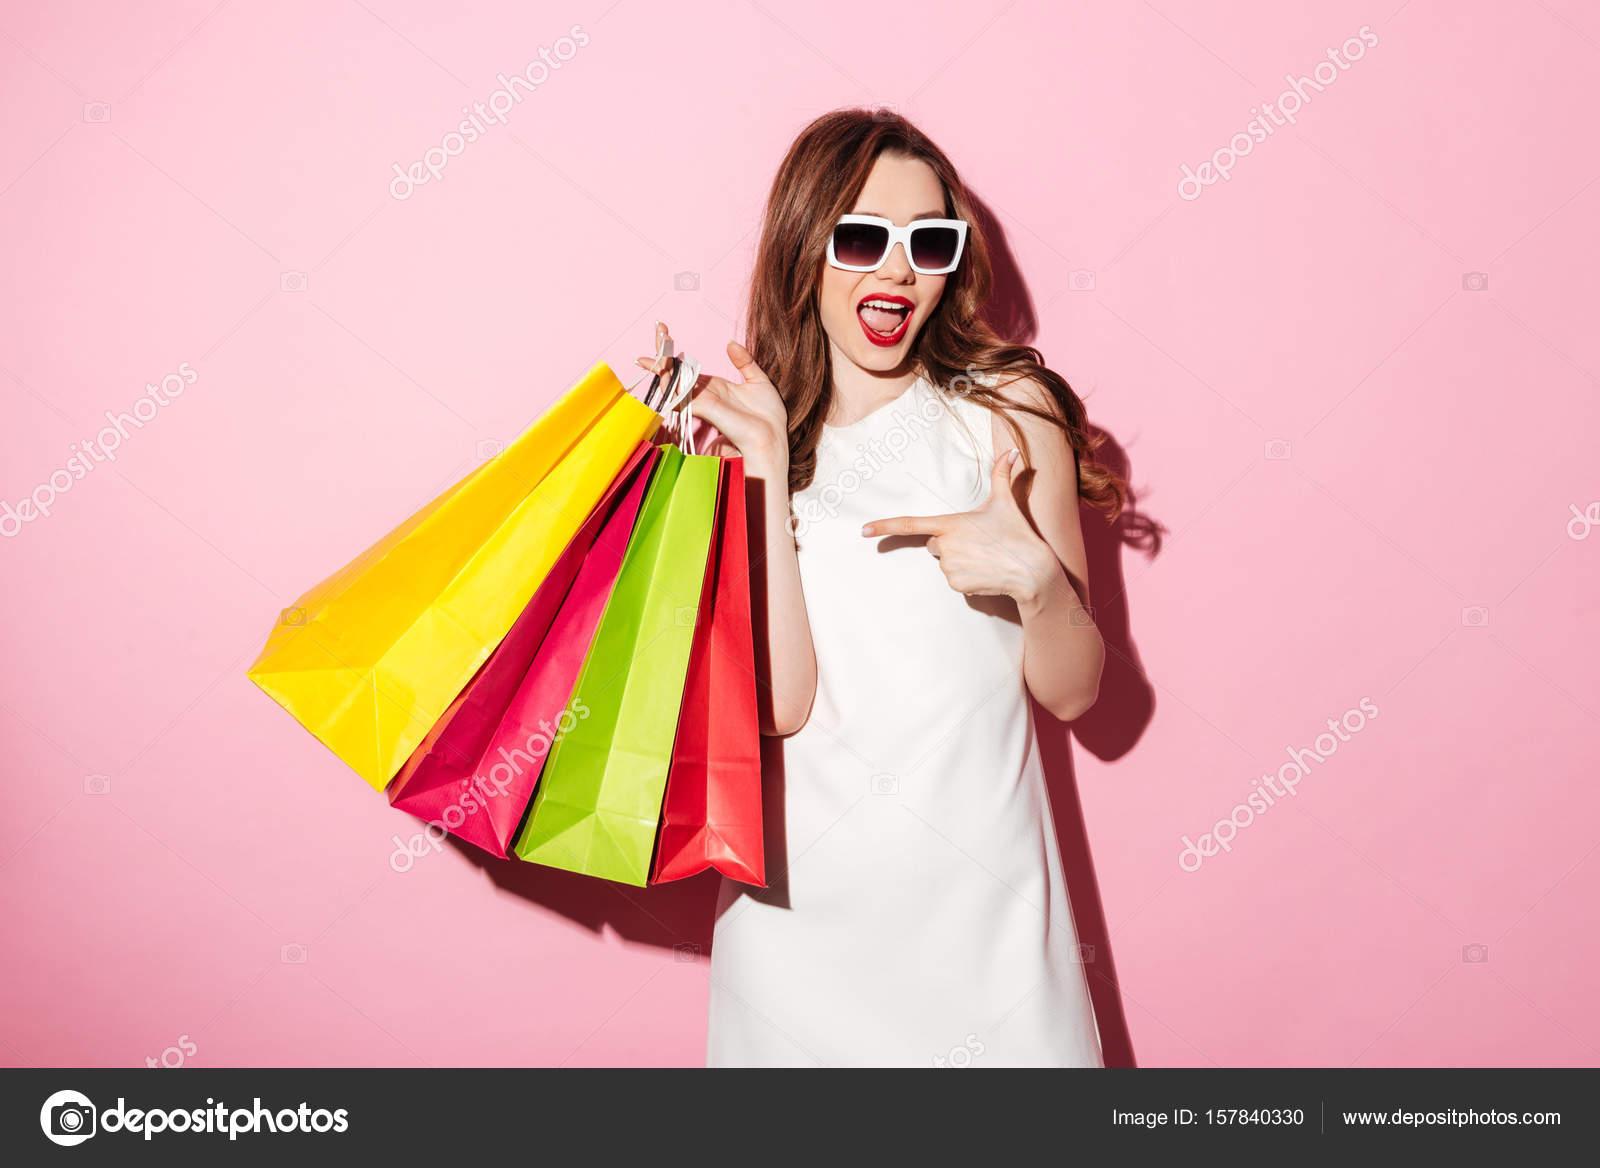 Impresionante joven morena con bolsas señalando — Foto de stock ...